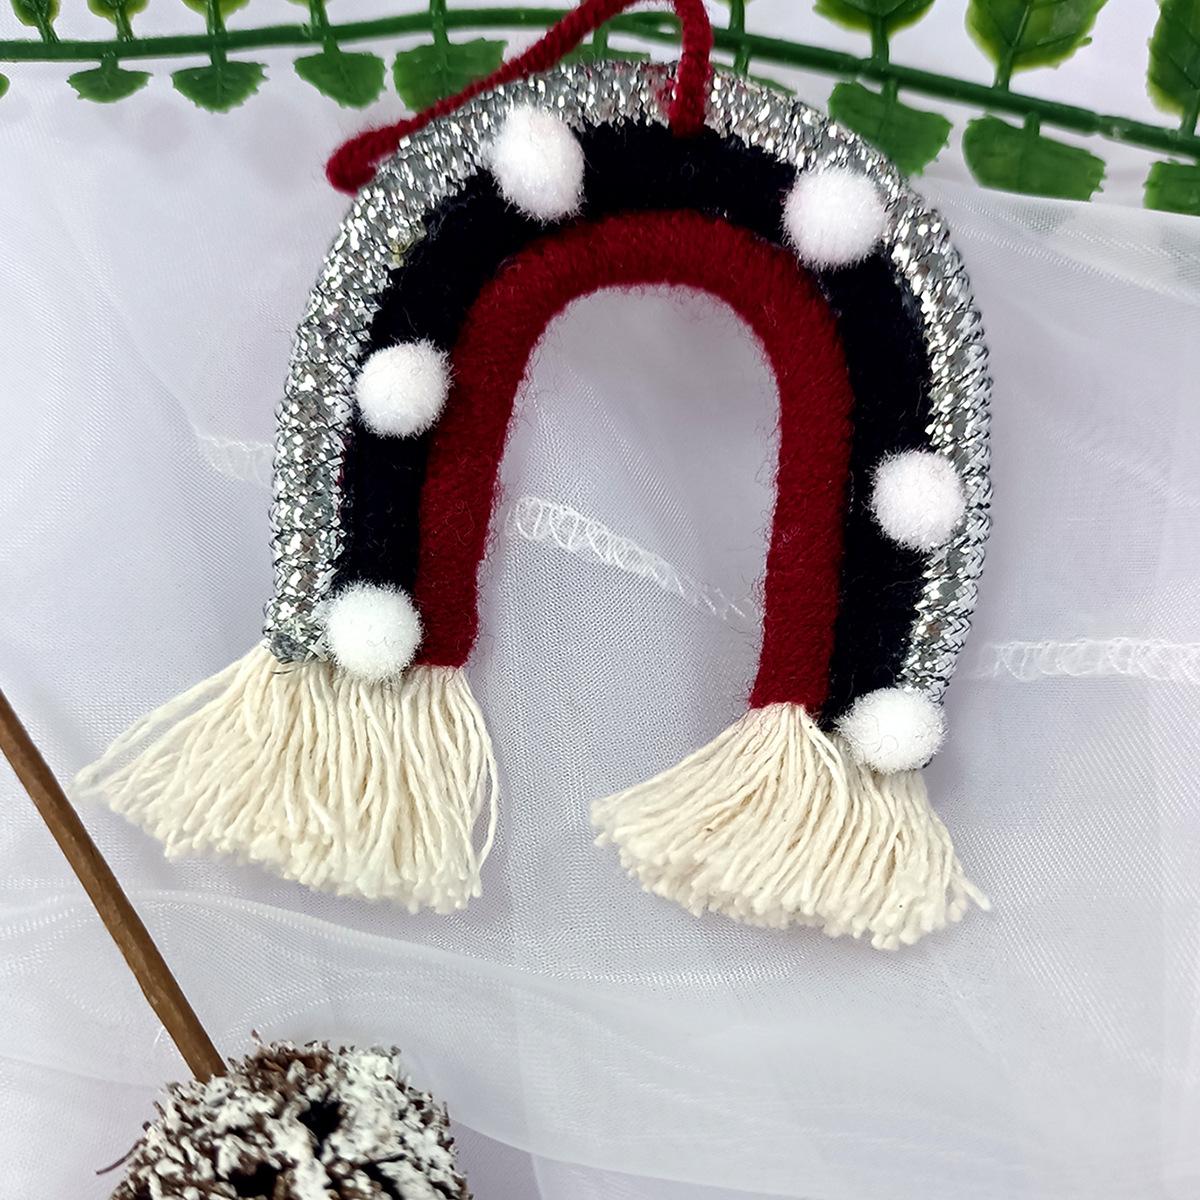 Christmas Rainbow Ornaments Christmas Tree Pendant For Household Decoration C07